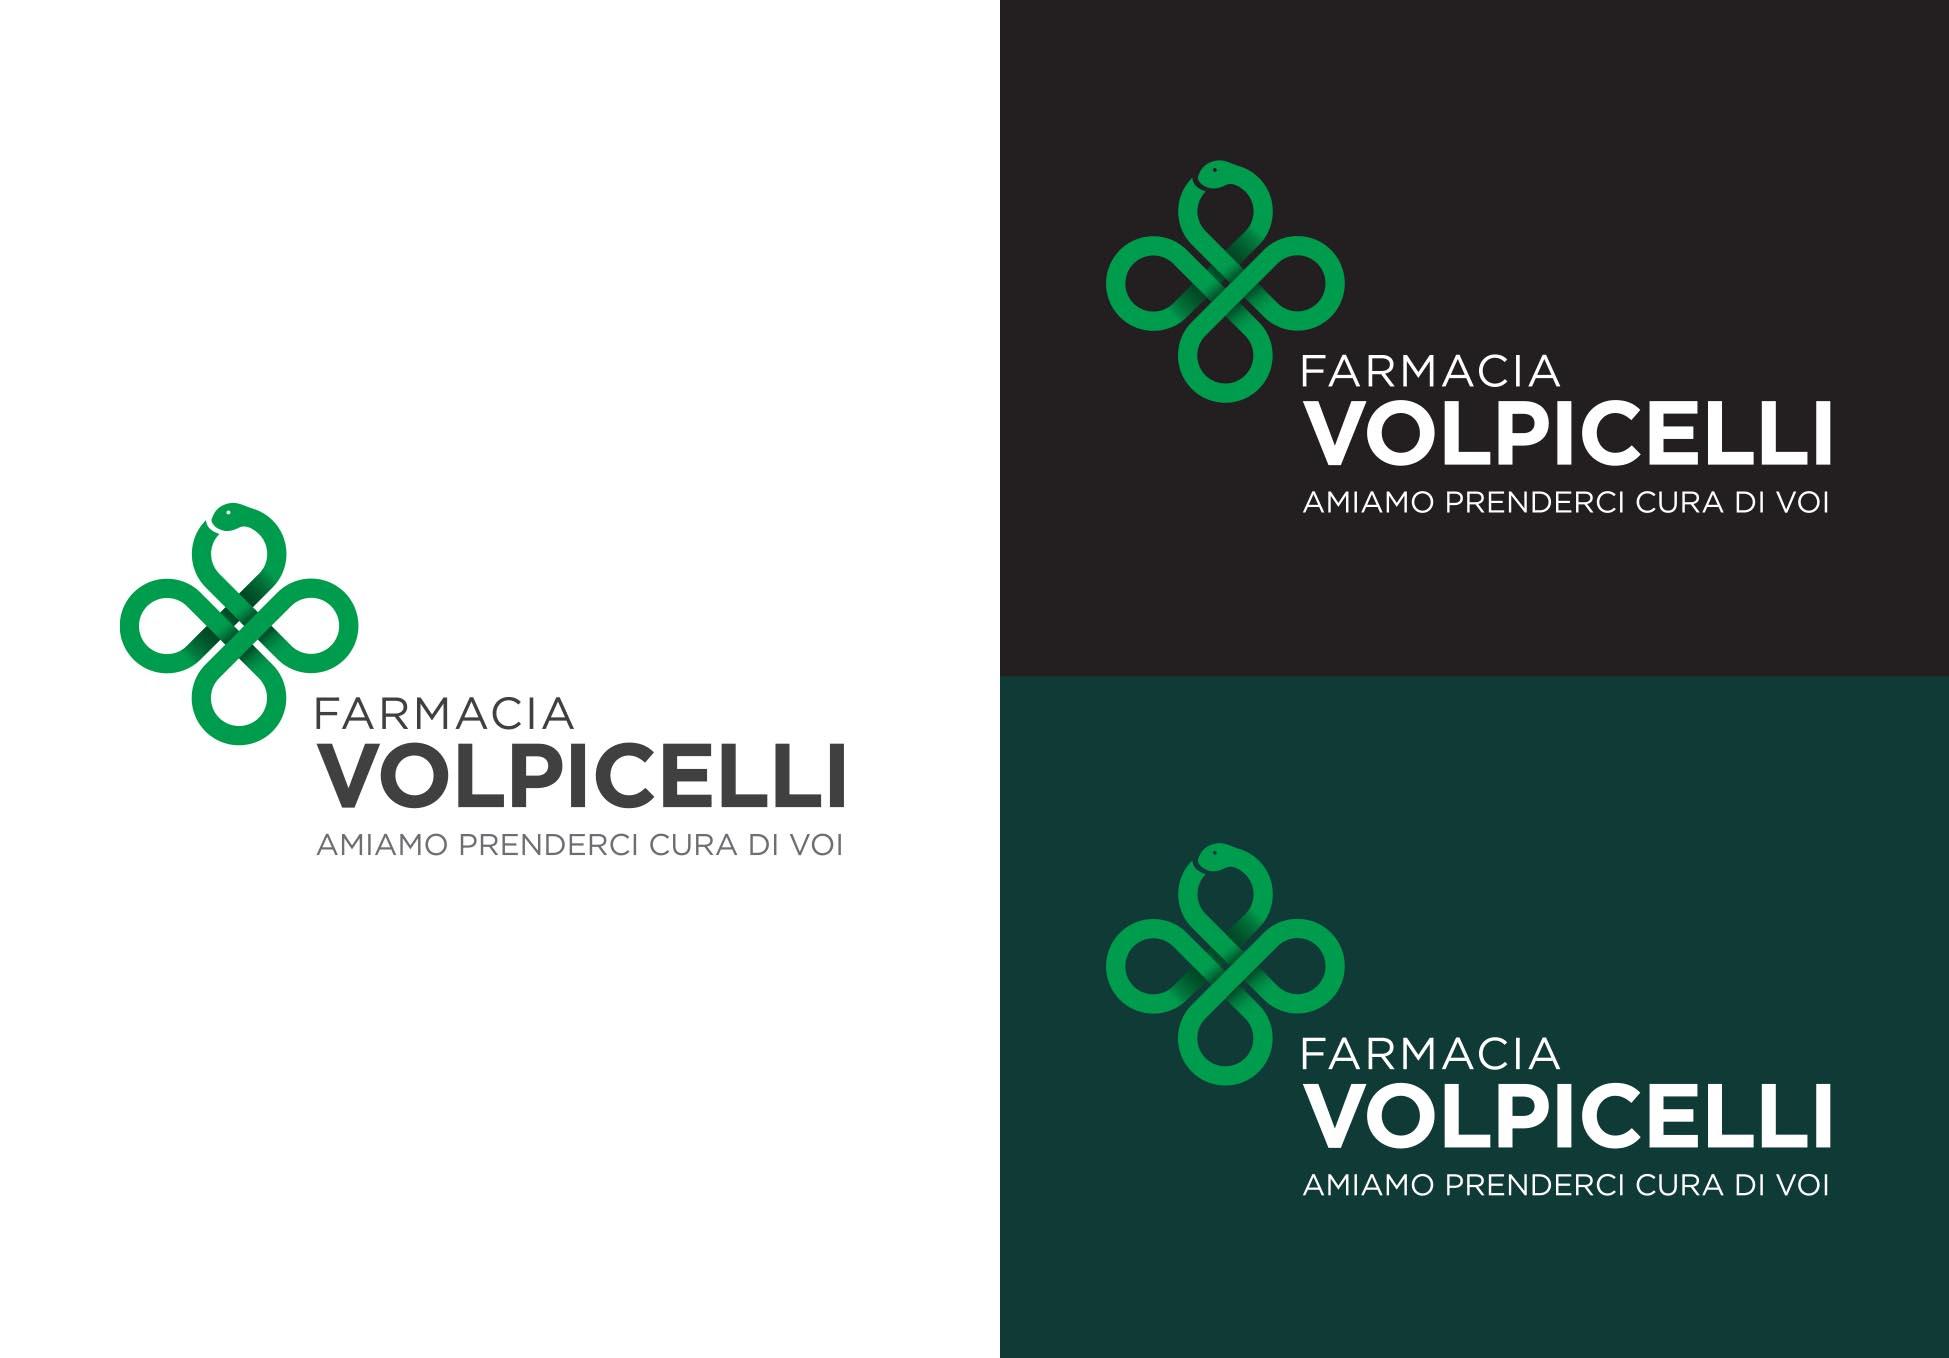 FARMACIAVOLPICELLI_logo_3